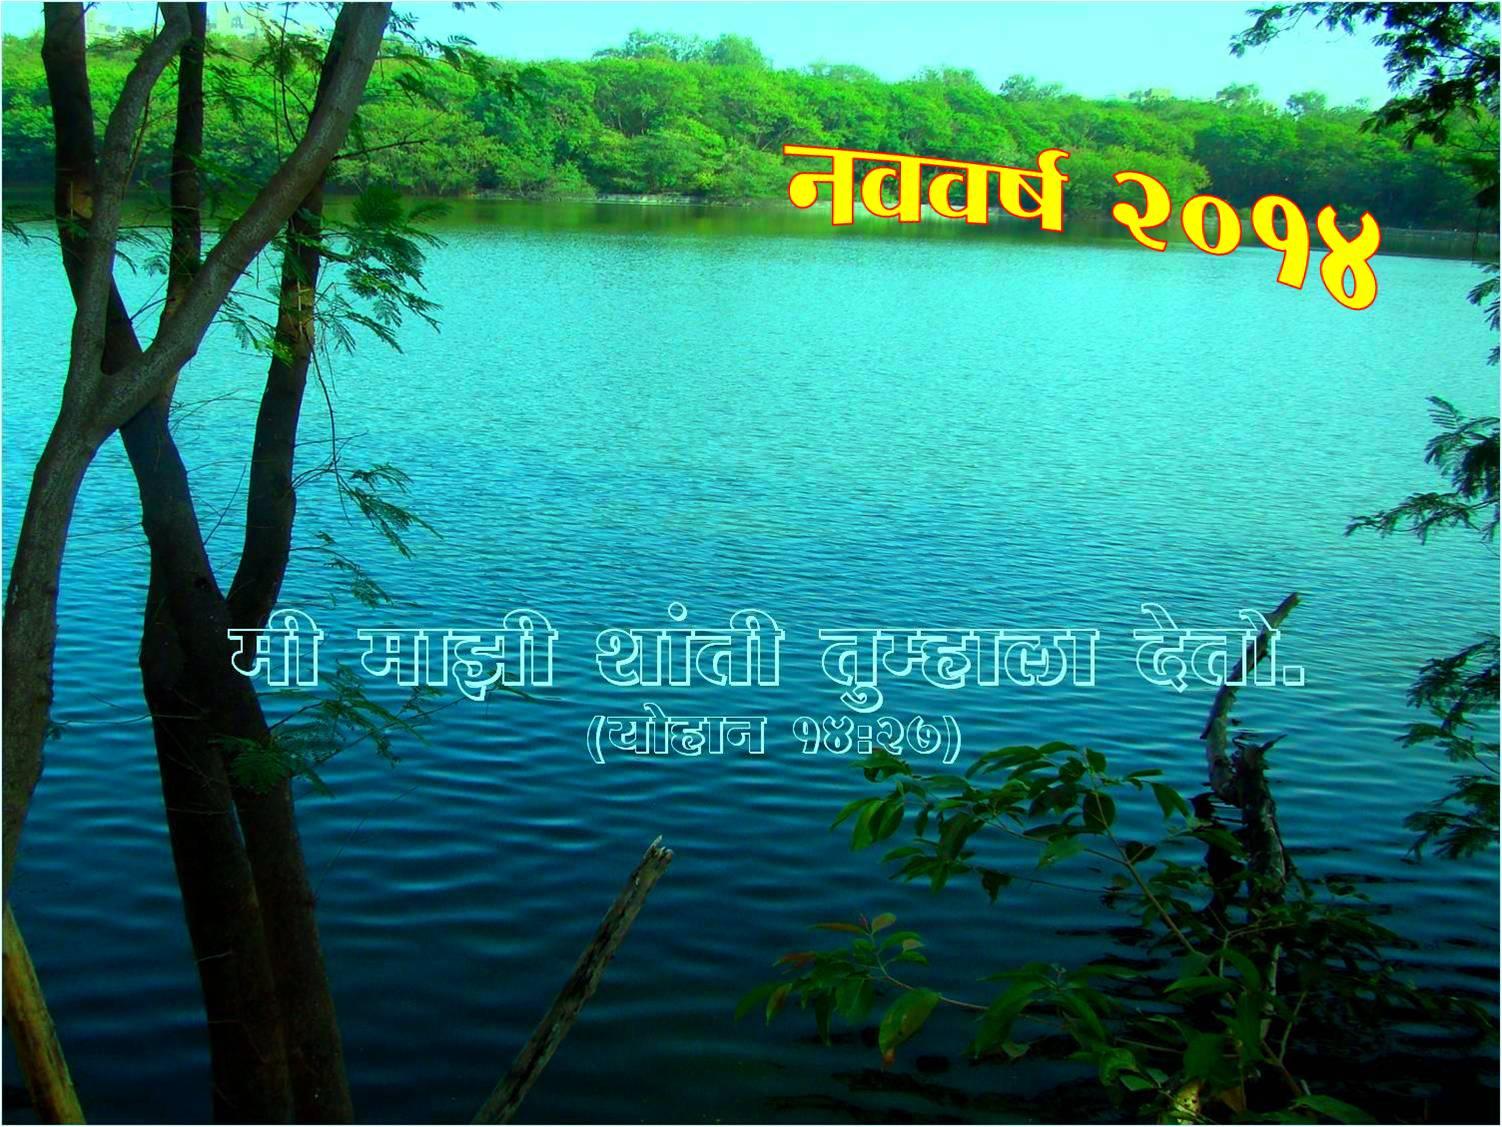 marathi bible wallpaper for - photo #2